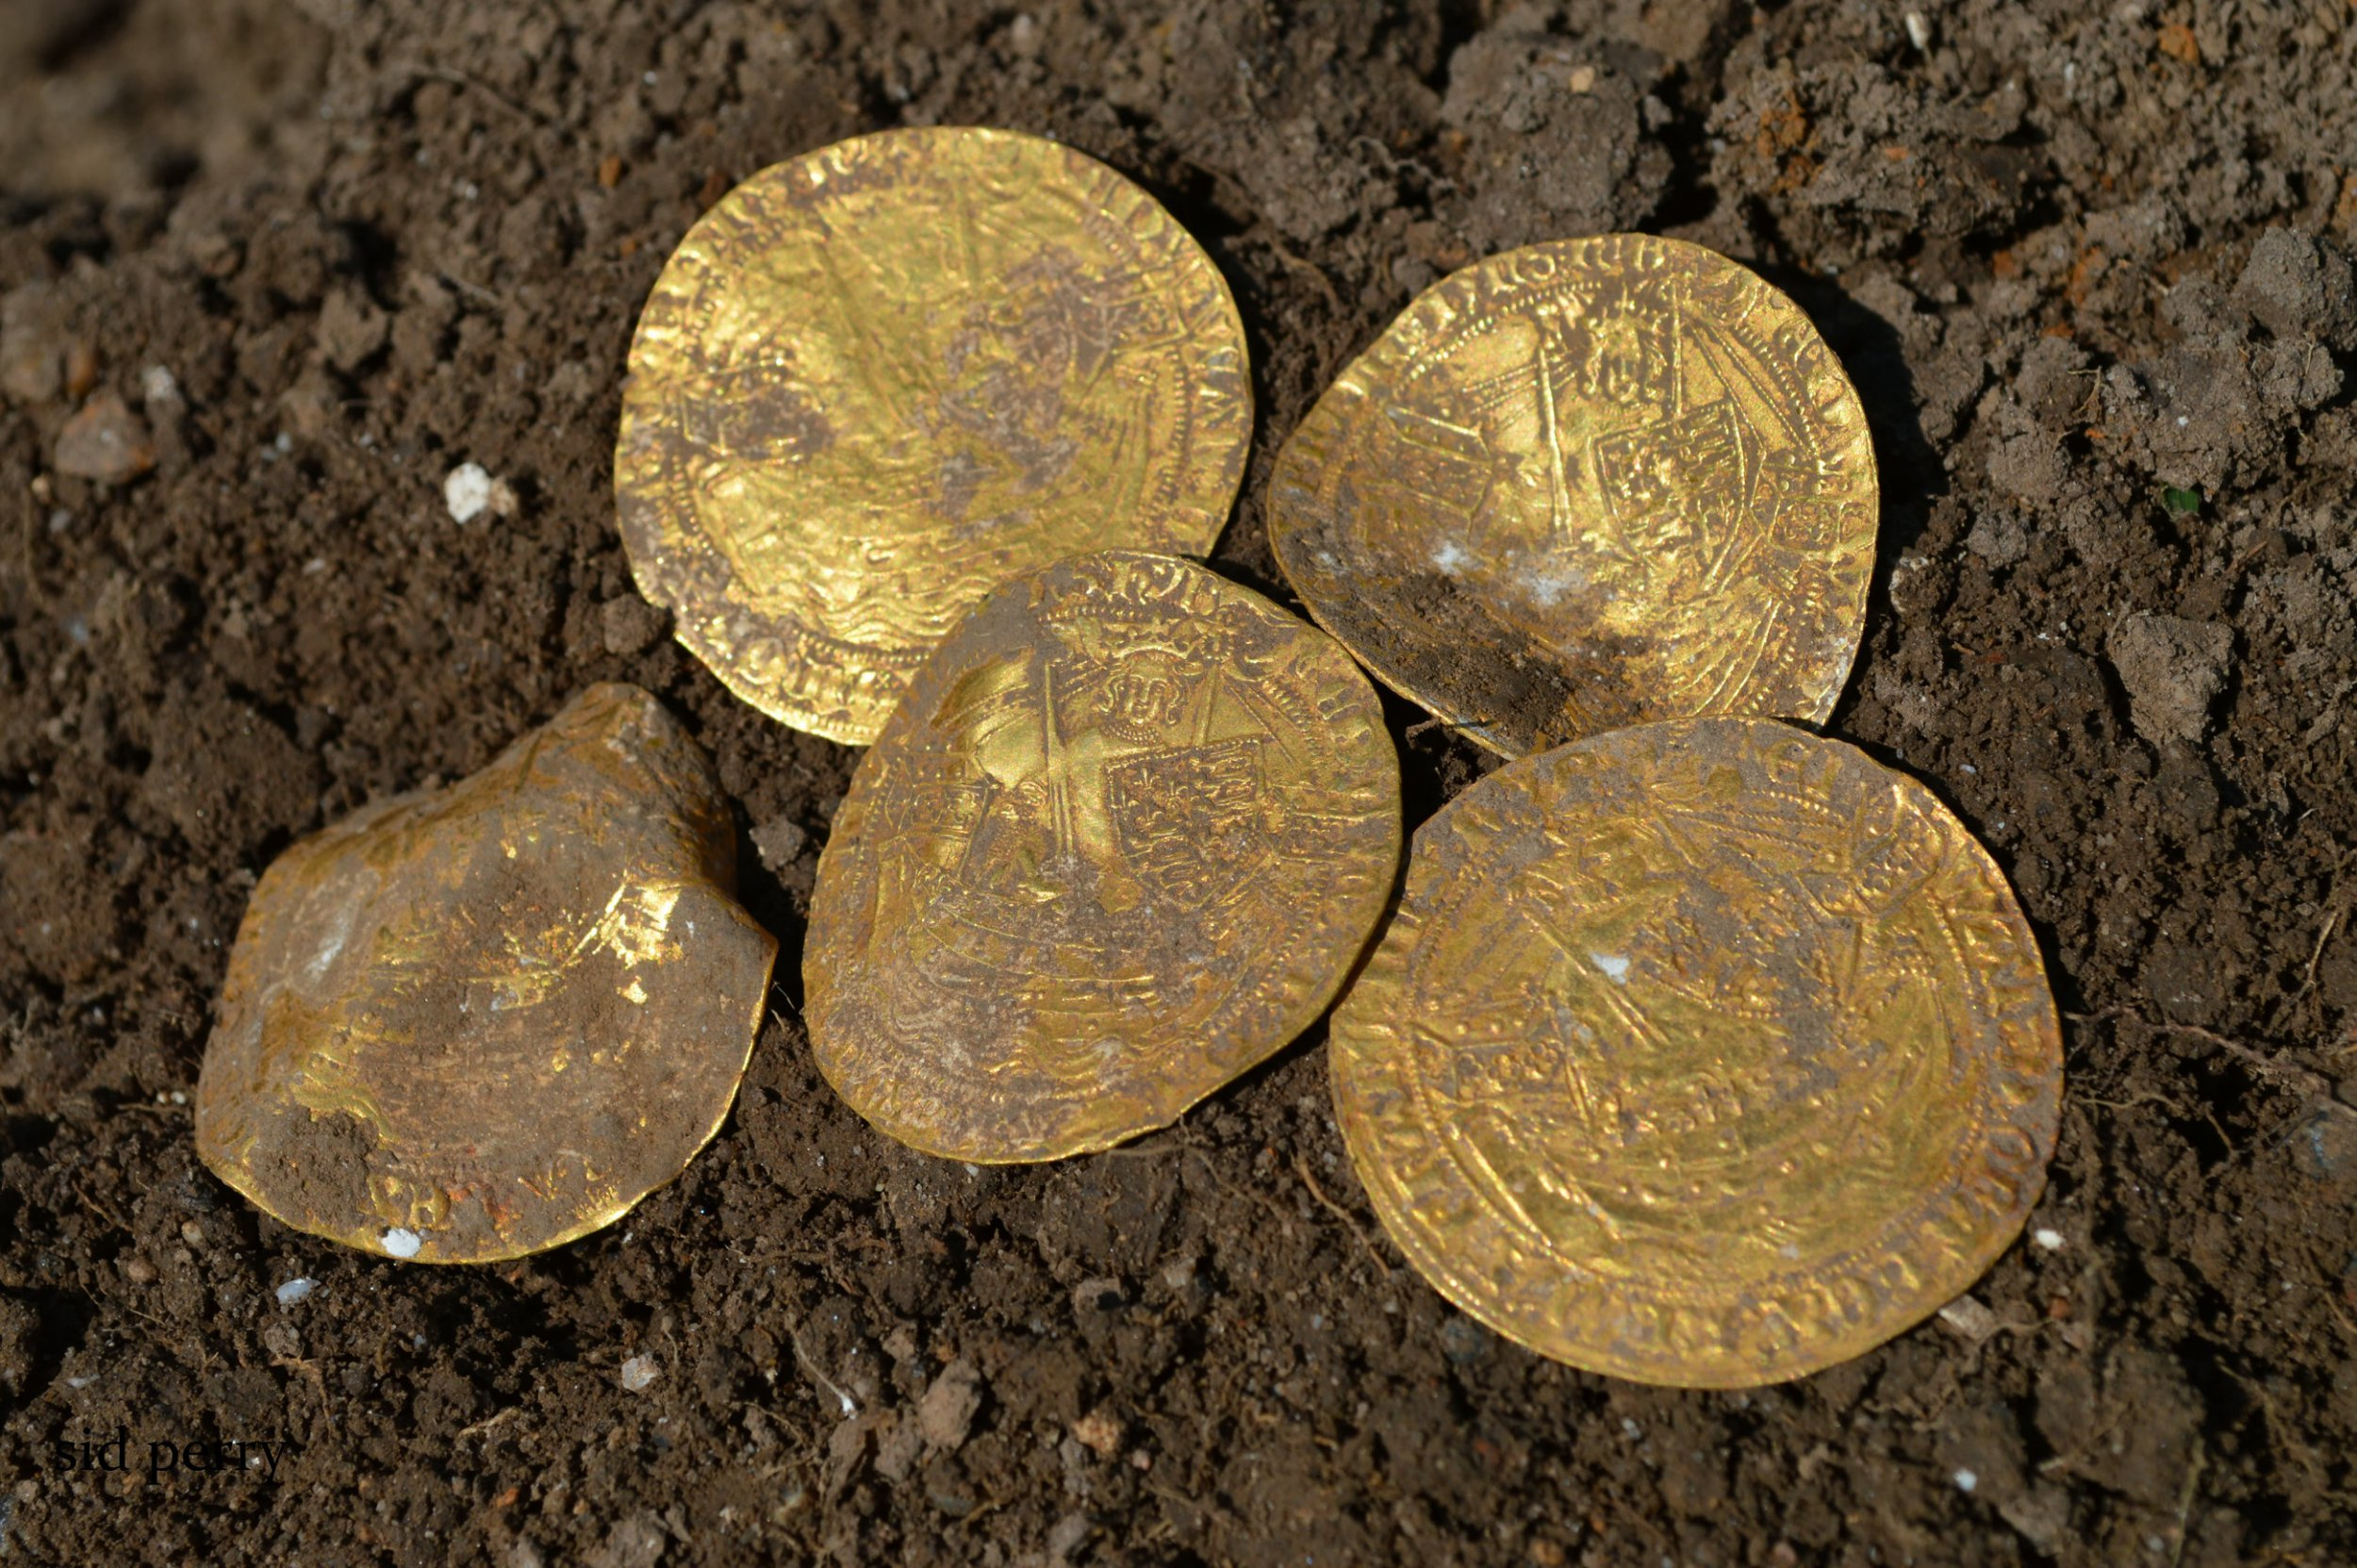 550 rare gold and silver 14th century